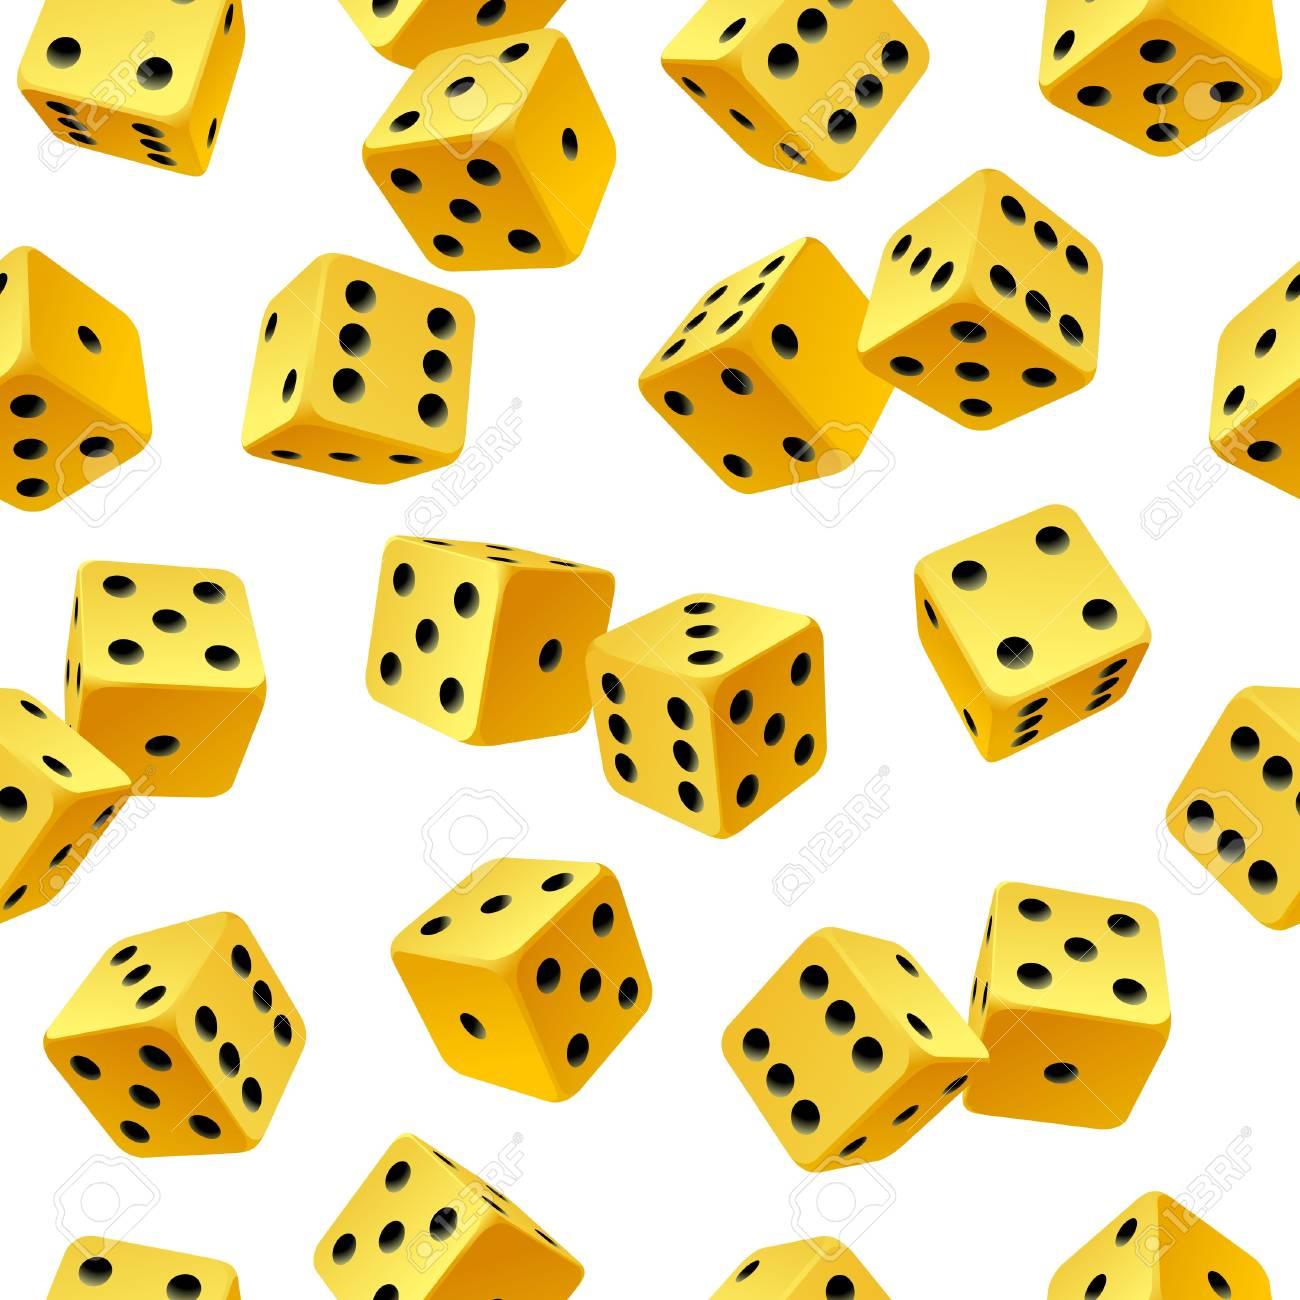 Vector yellow dice seamless background Stock Vector - 12796657